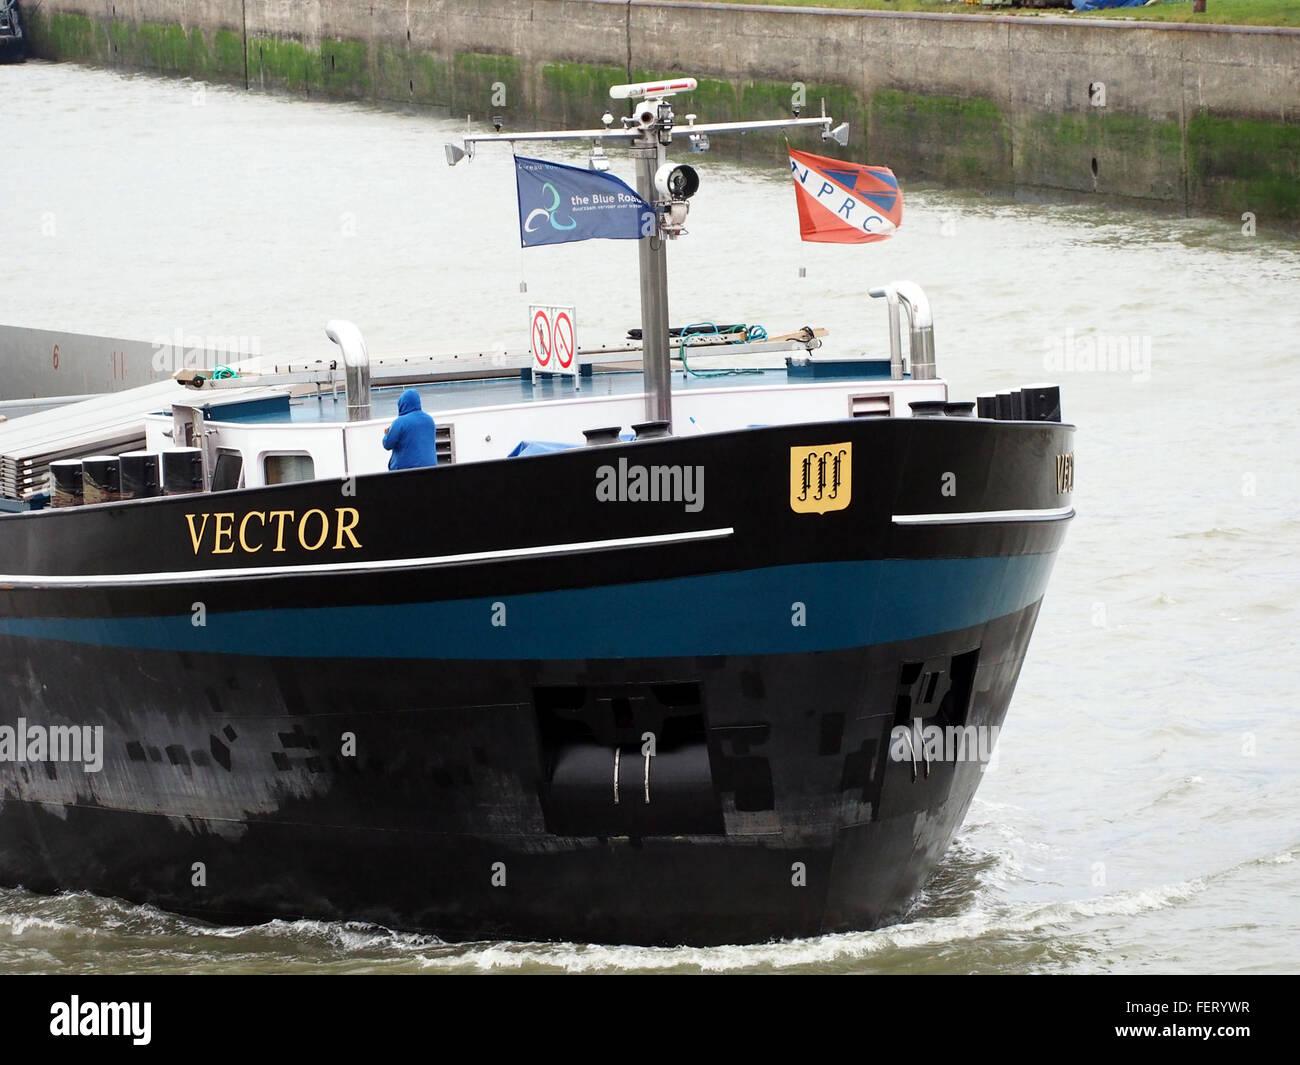 Vector (barco, 2008), ENI 02331015 Puerto de Amberes pic6 Imagen De Stock